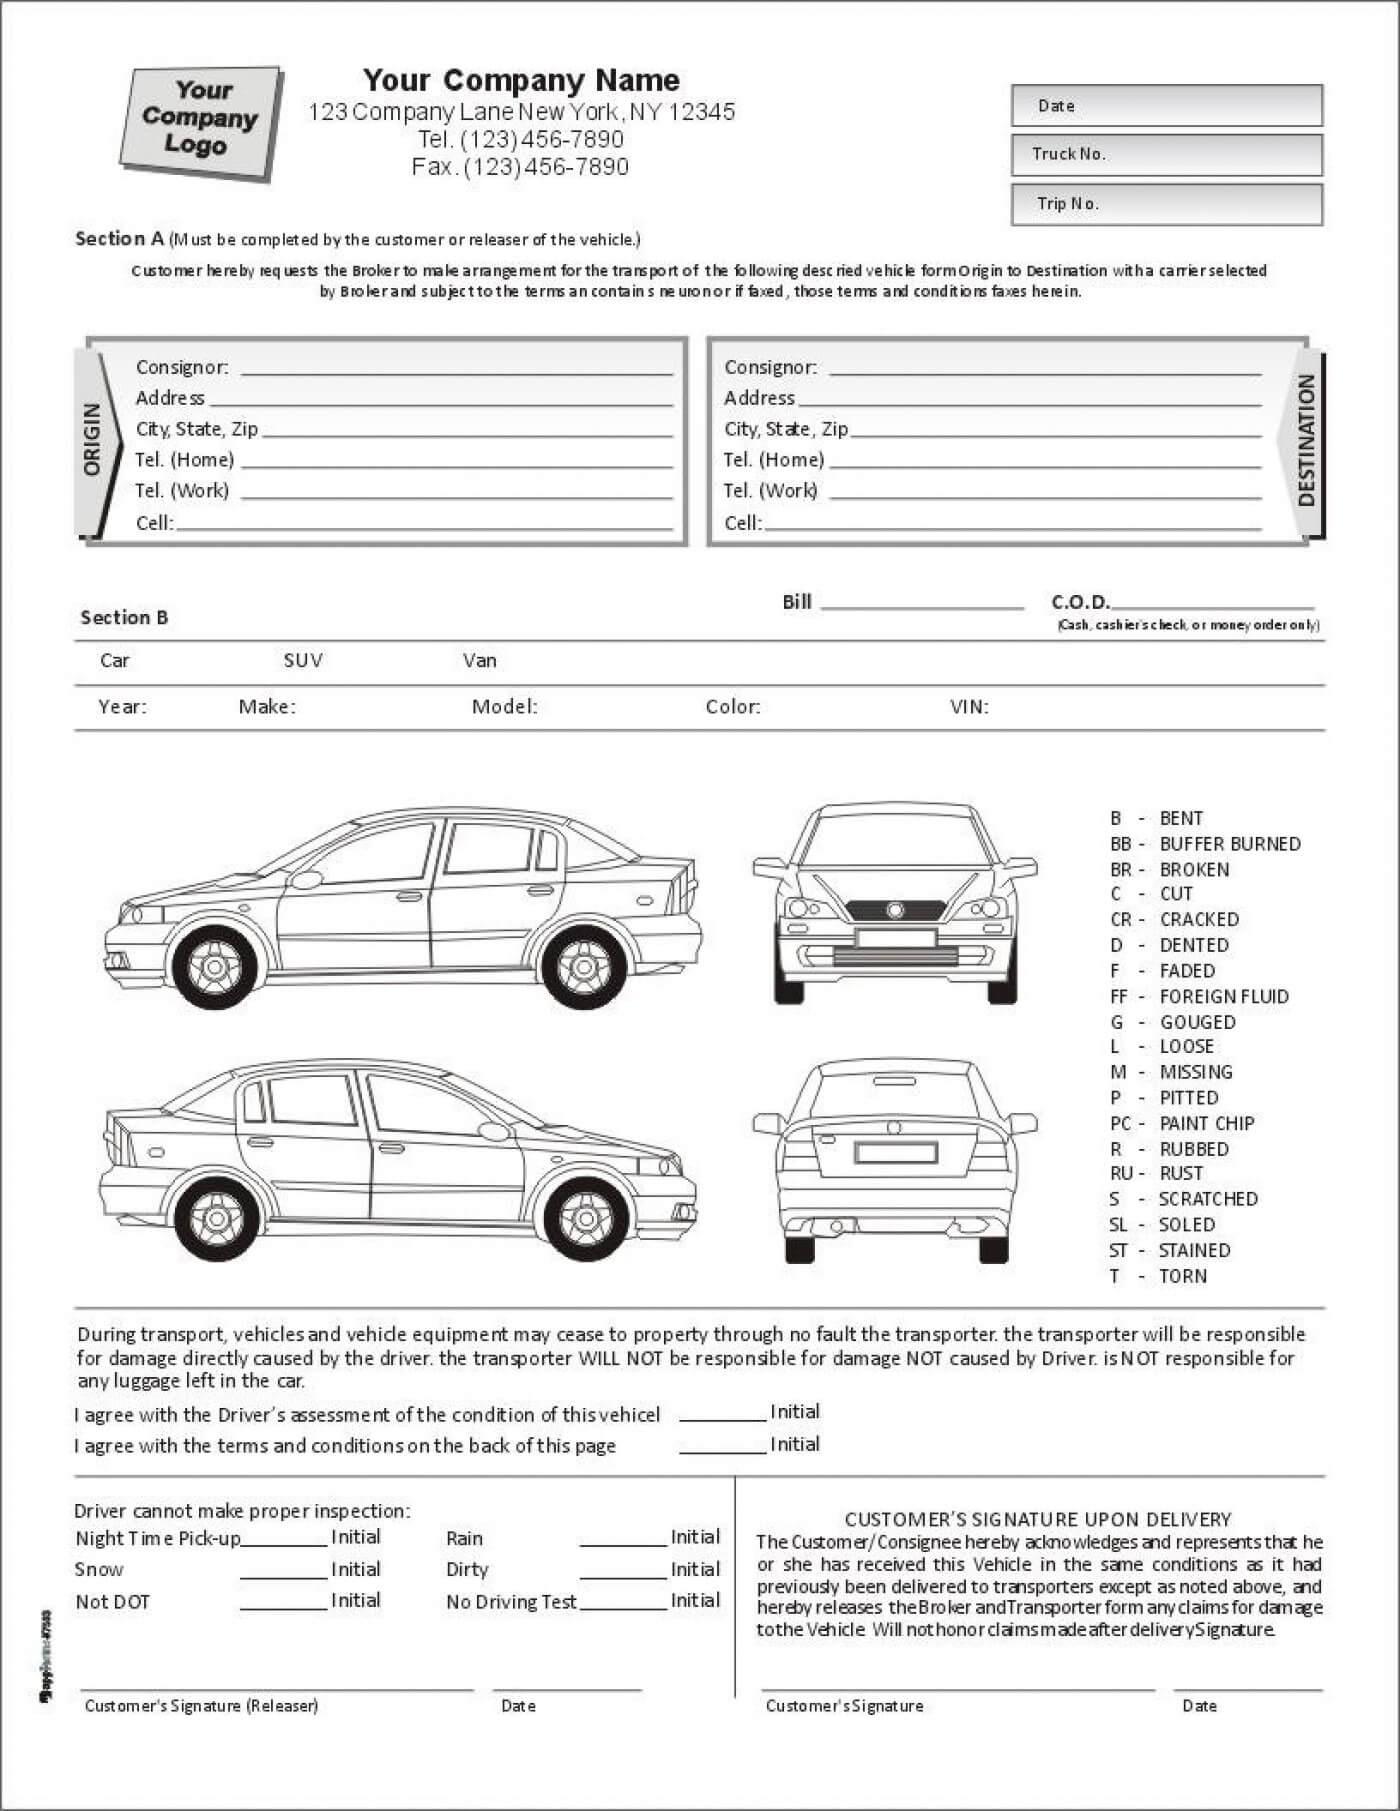 E84B Vehicle Damage Report Template | Wiring Resources With Car Damage Report Template